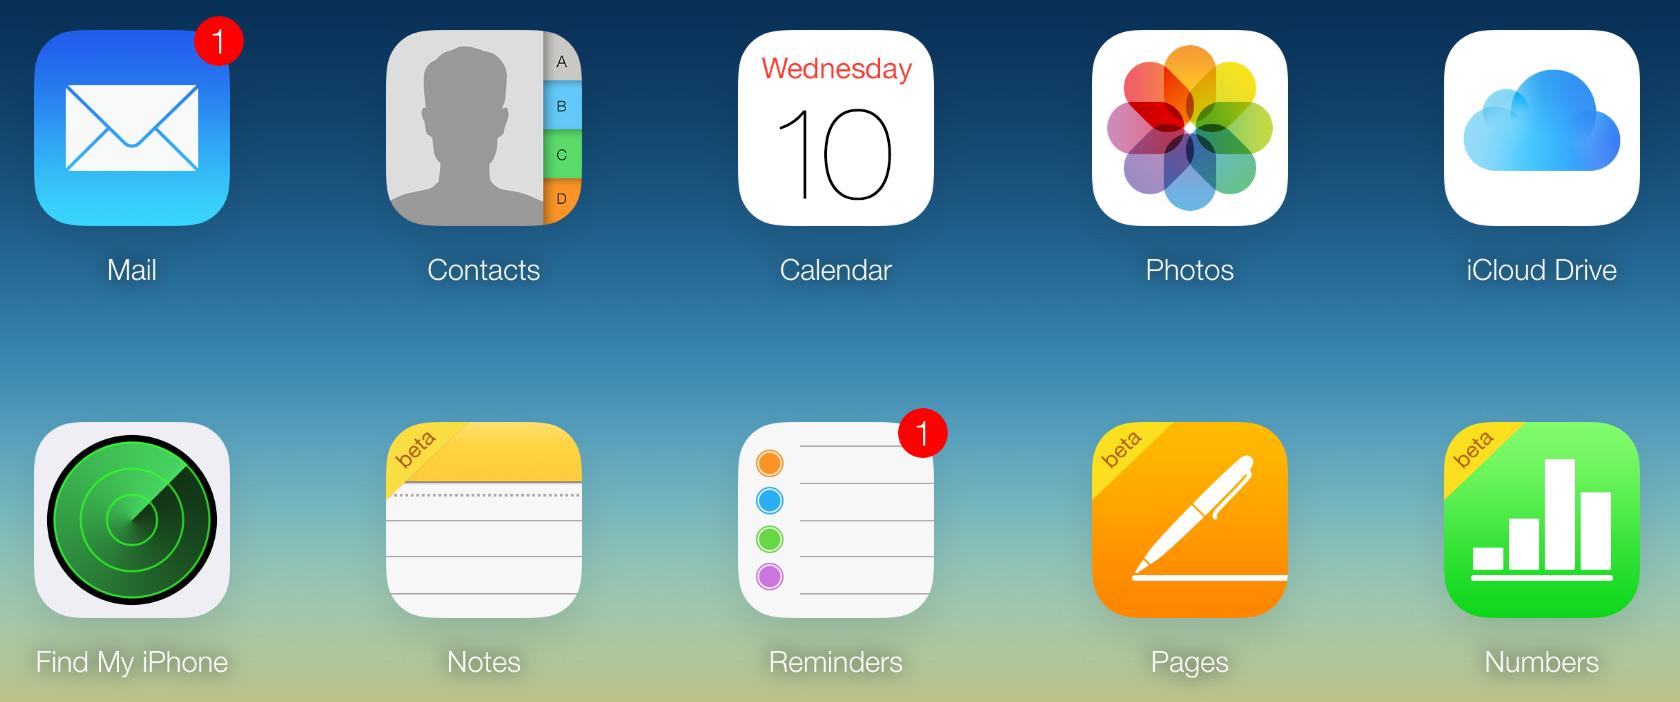 iCloud.com에 새로운 메모 베타 추가.